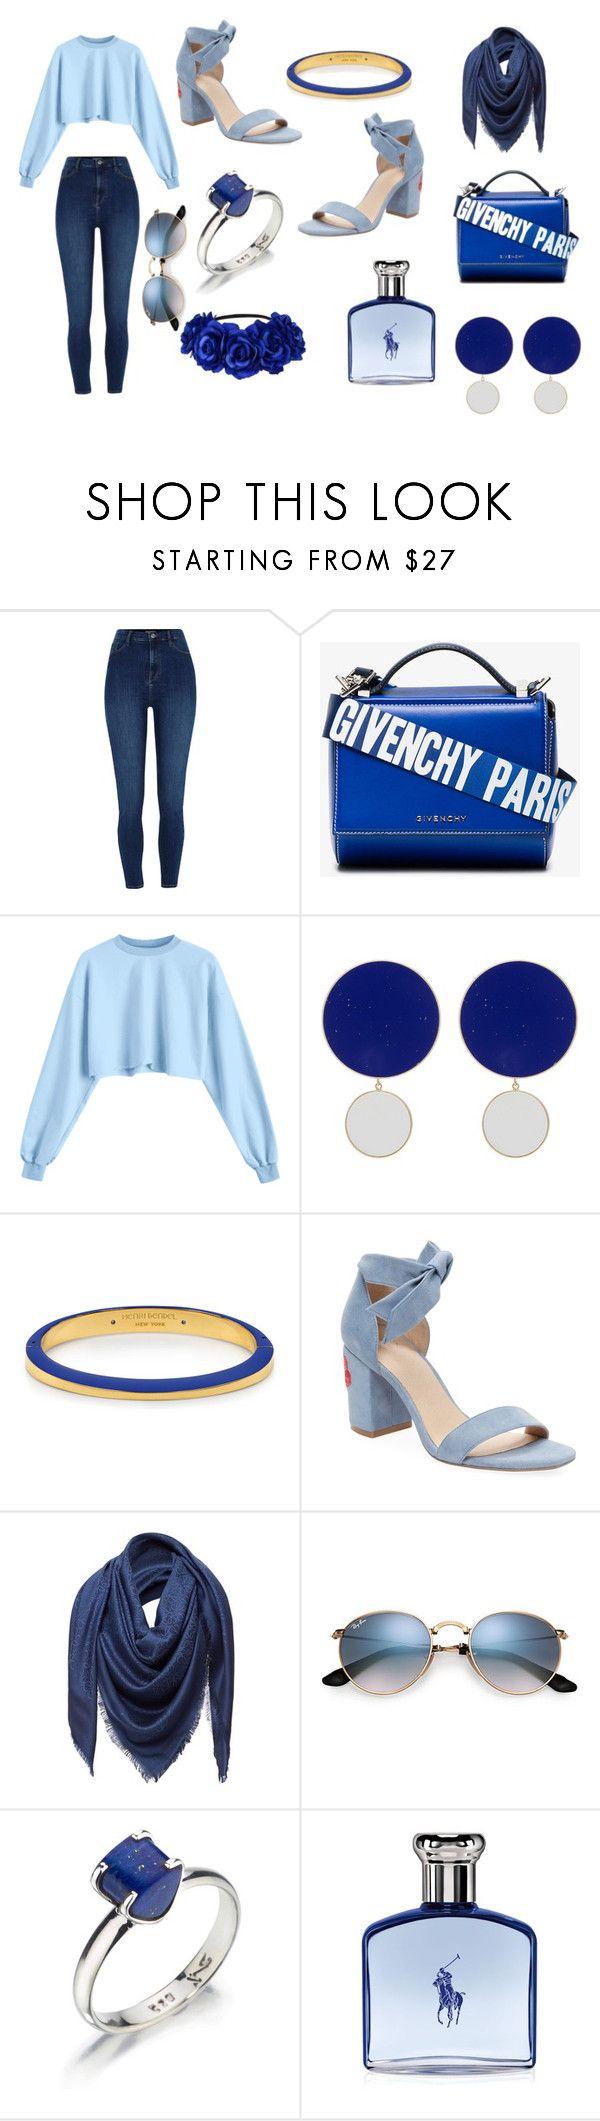 """Blue"" by zdmtlkmp on Polyvore featuring Givenchy, Joanna Laura Constantine, Henri Bendel, Alex + Alex, Loewe, Lazuli and Ralph Lauren"